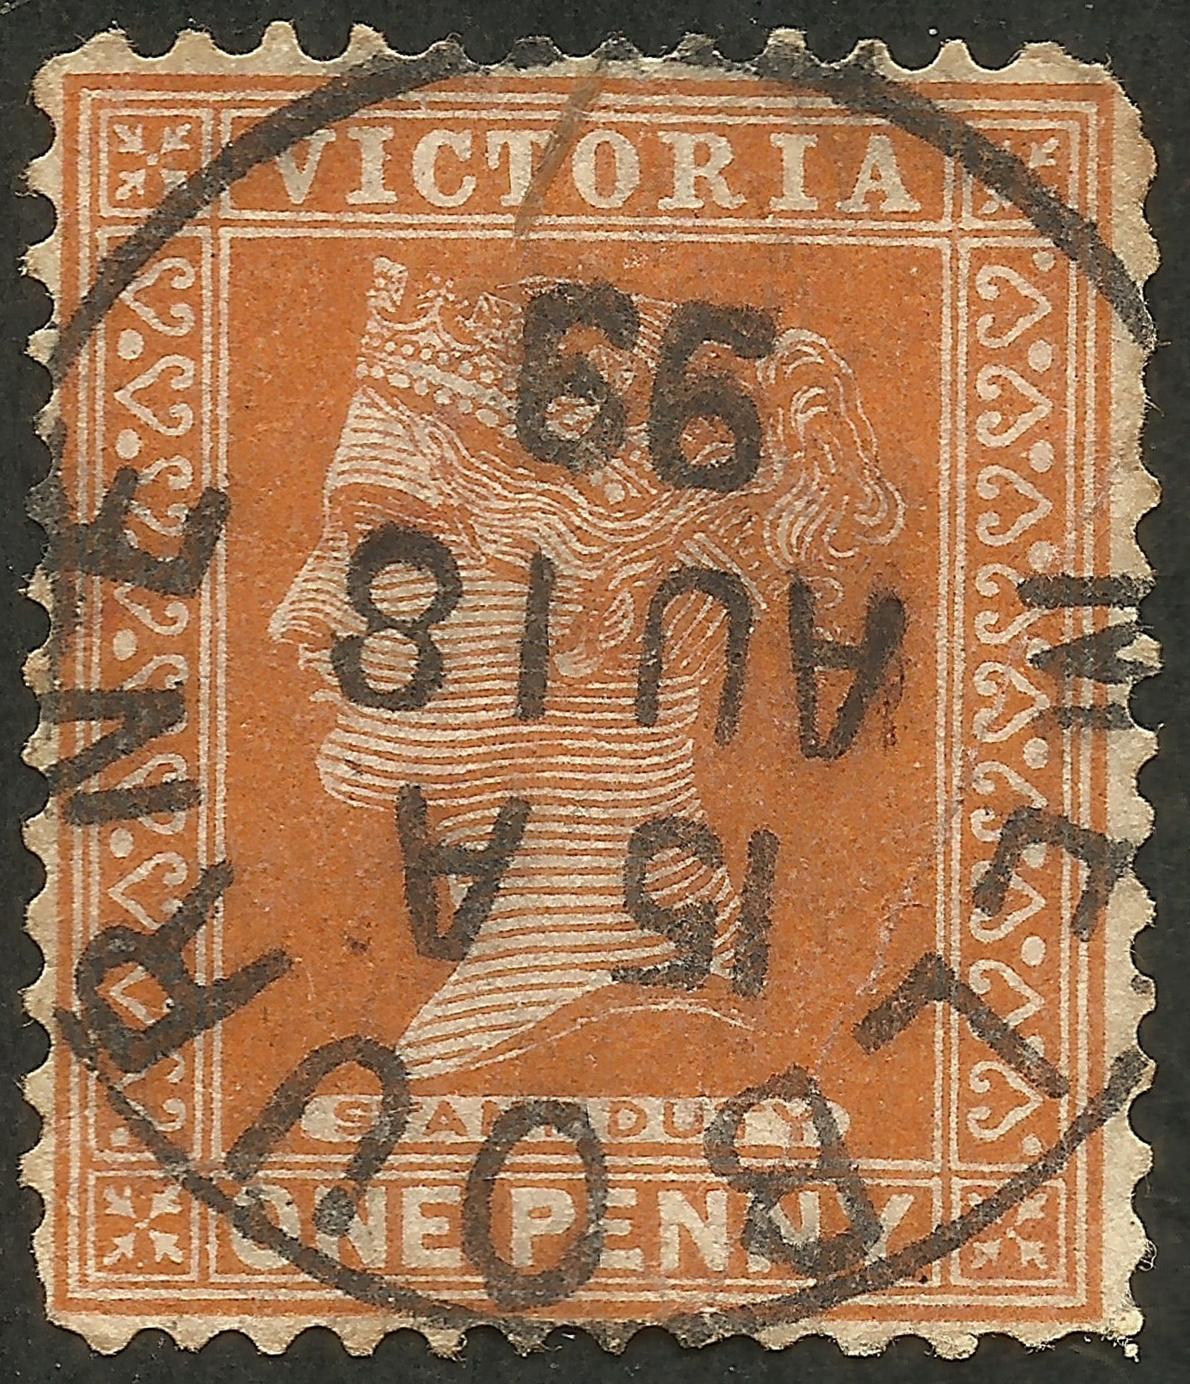 Victoria - Scott #169 (1890)